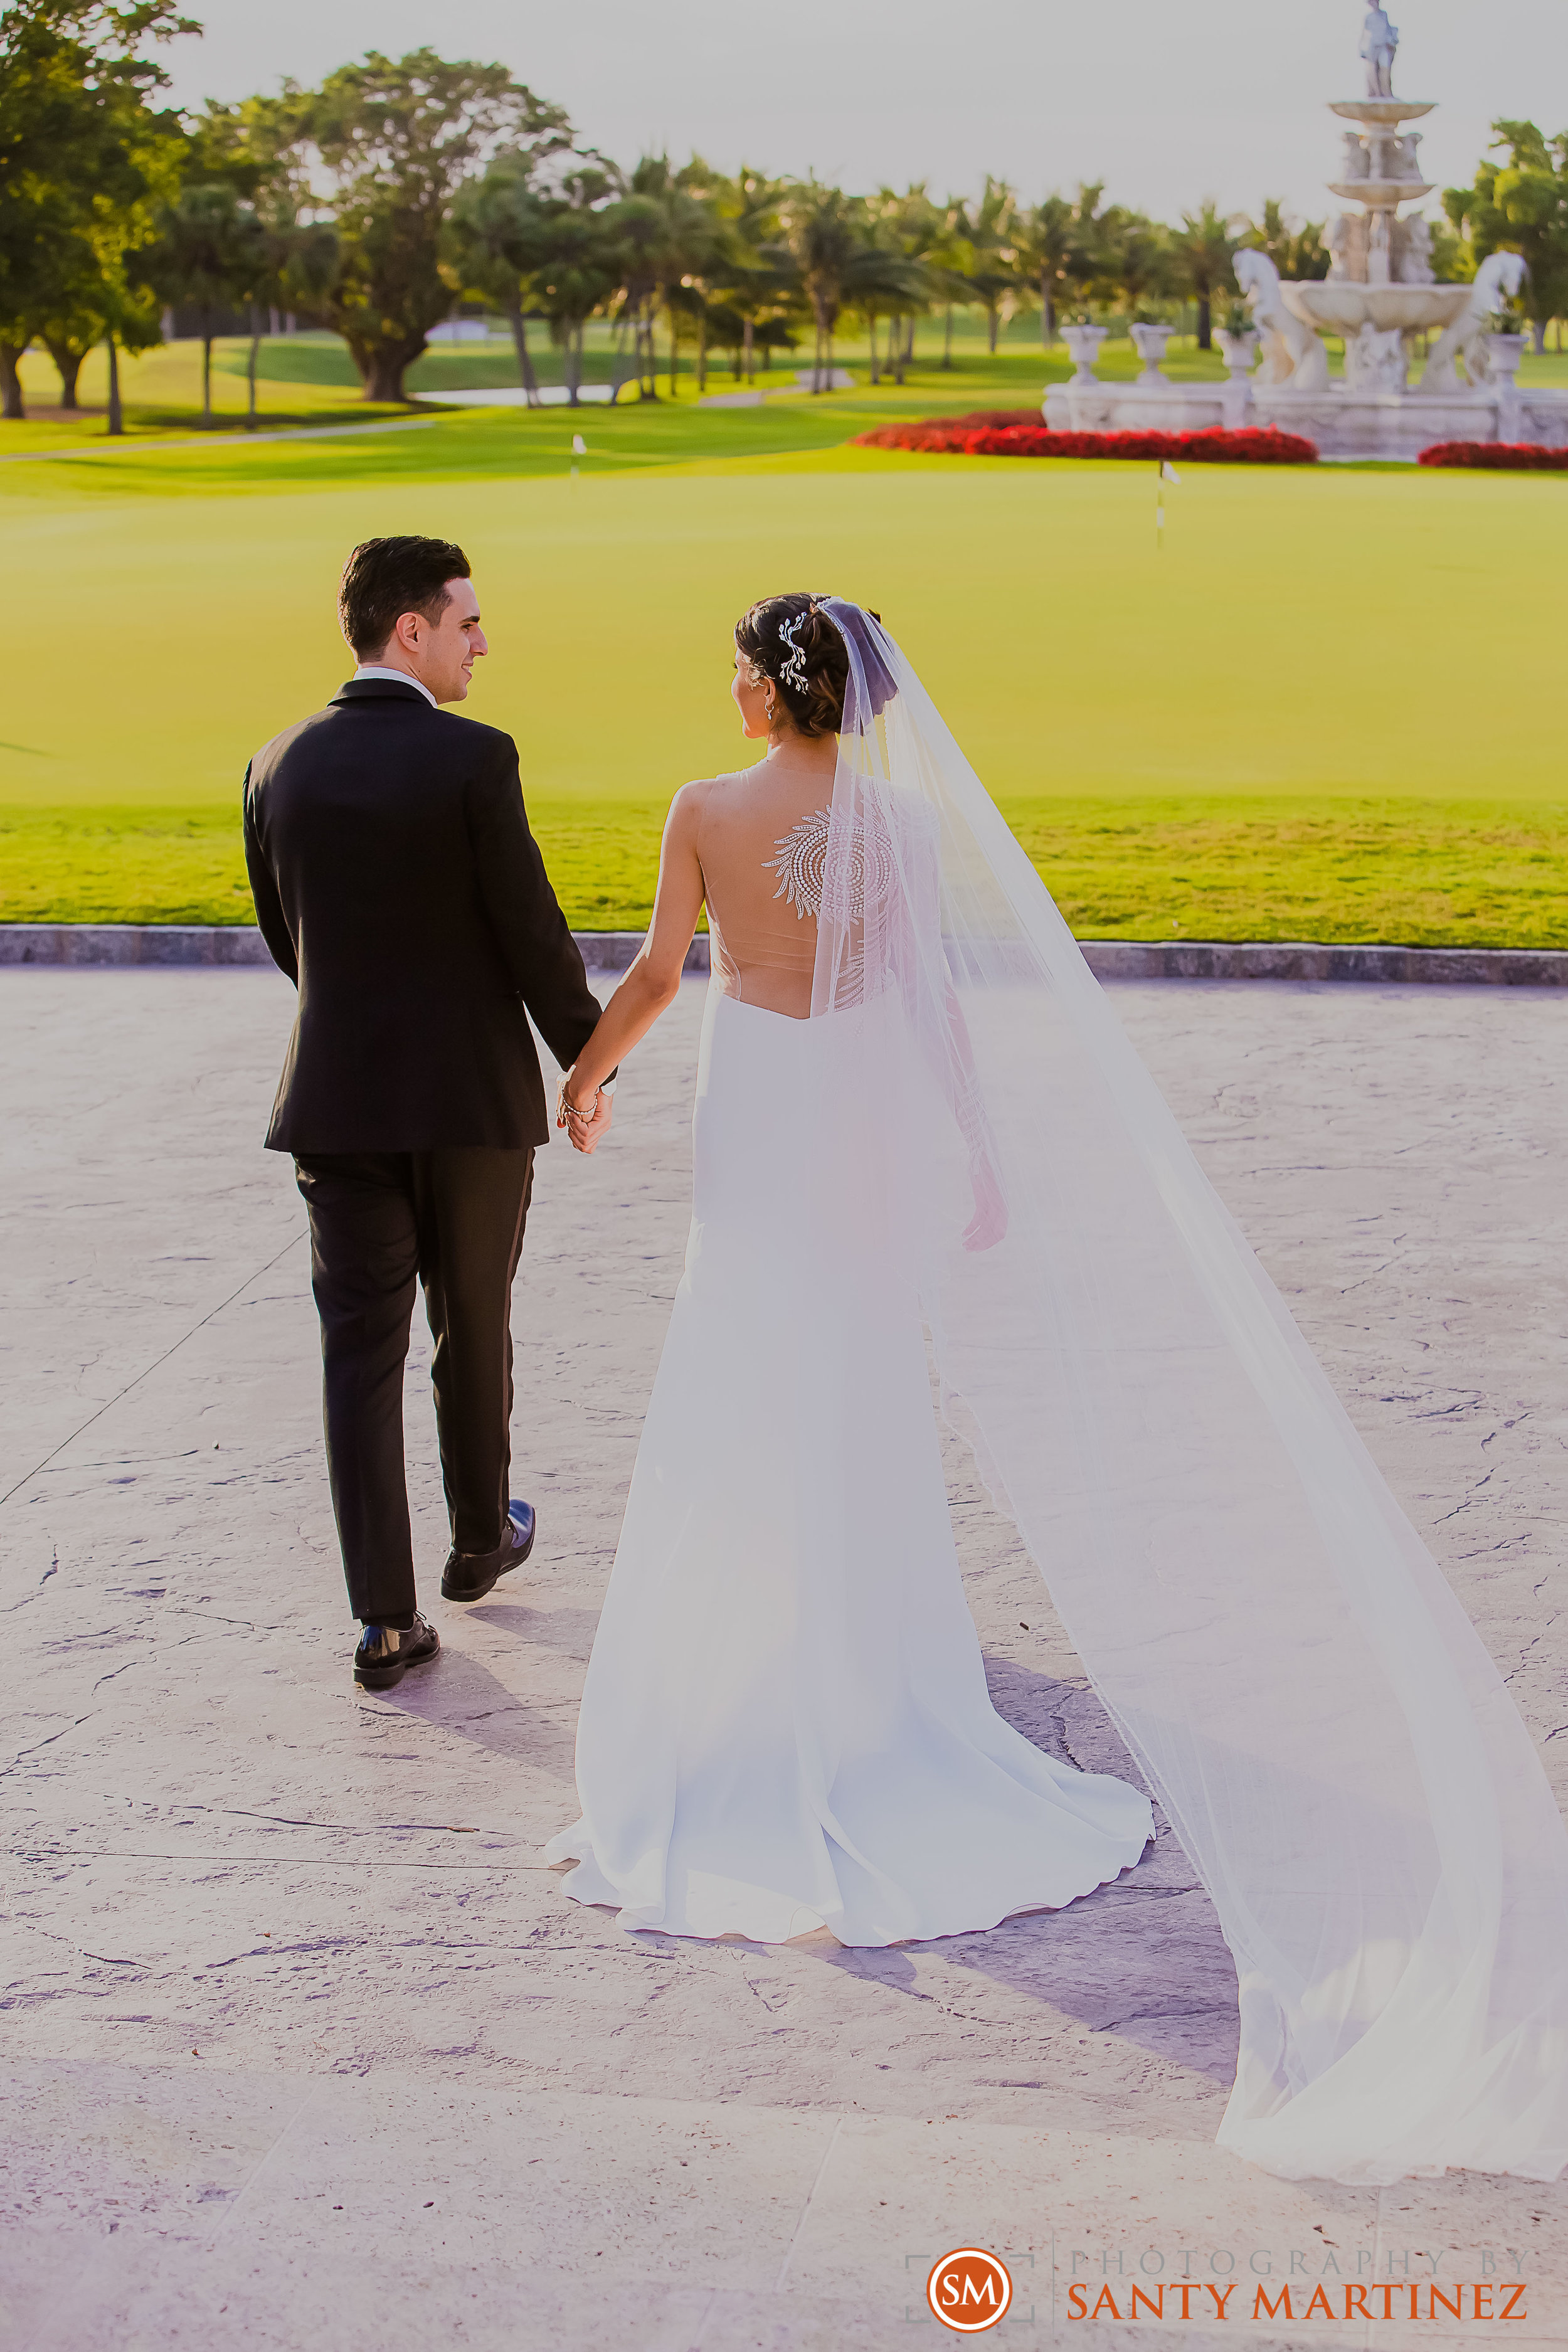 Wedding Trump National Doral Miami - Santy Martinez Photography-5.jpg